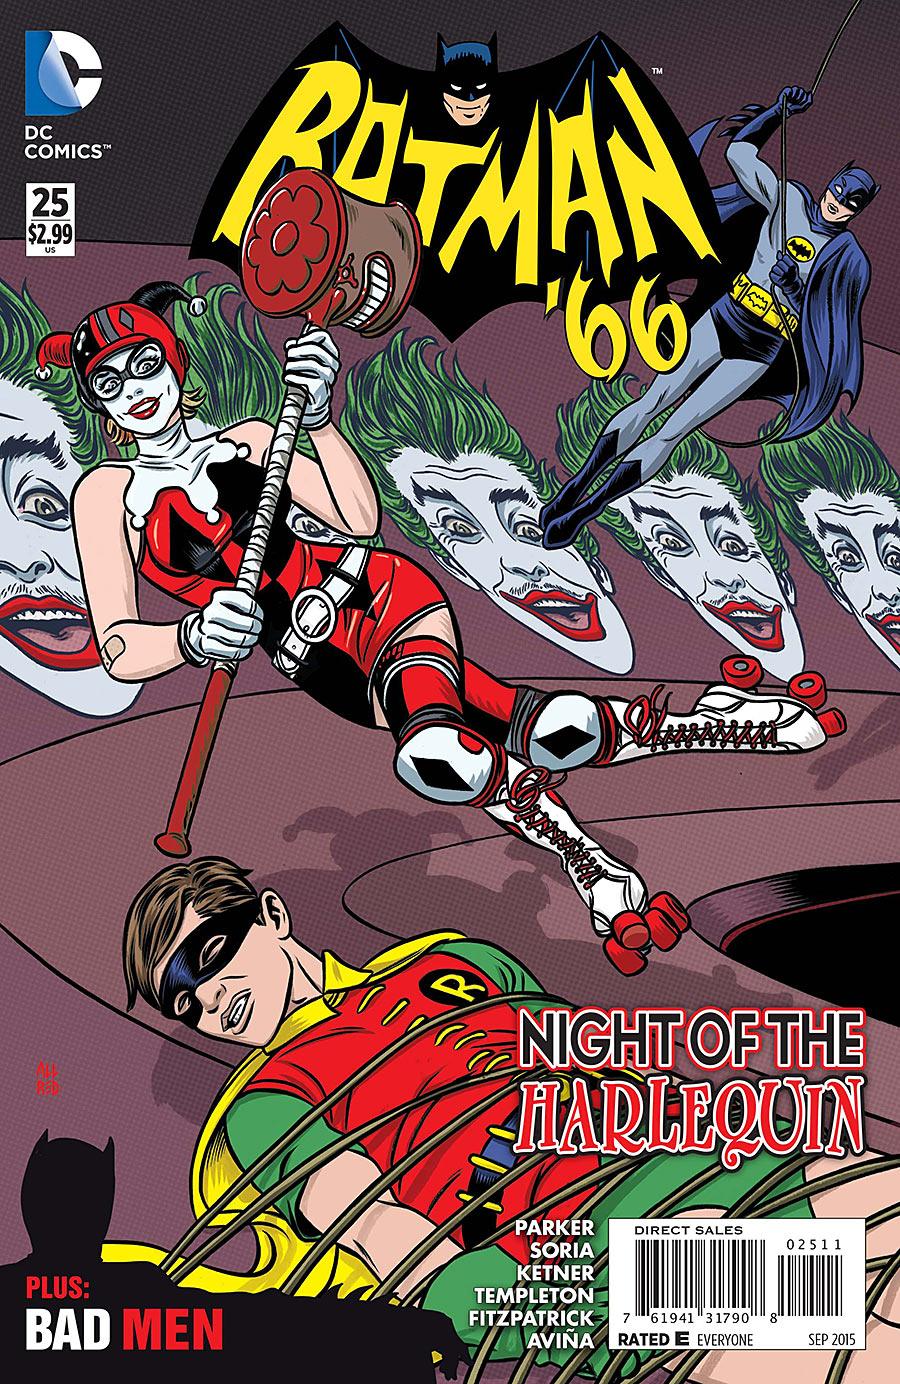 Batman 66 Vol 1 25 Dc Database Fandom Powered By Wikia